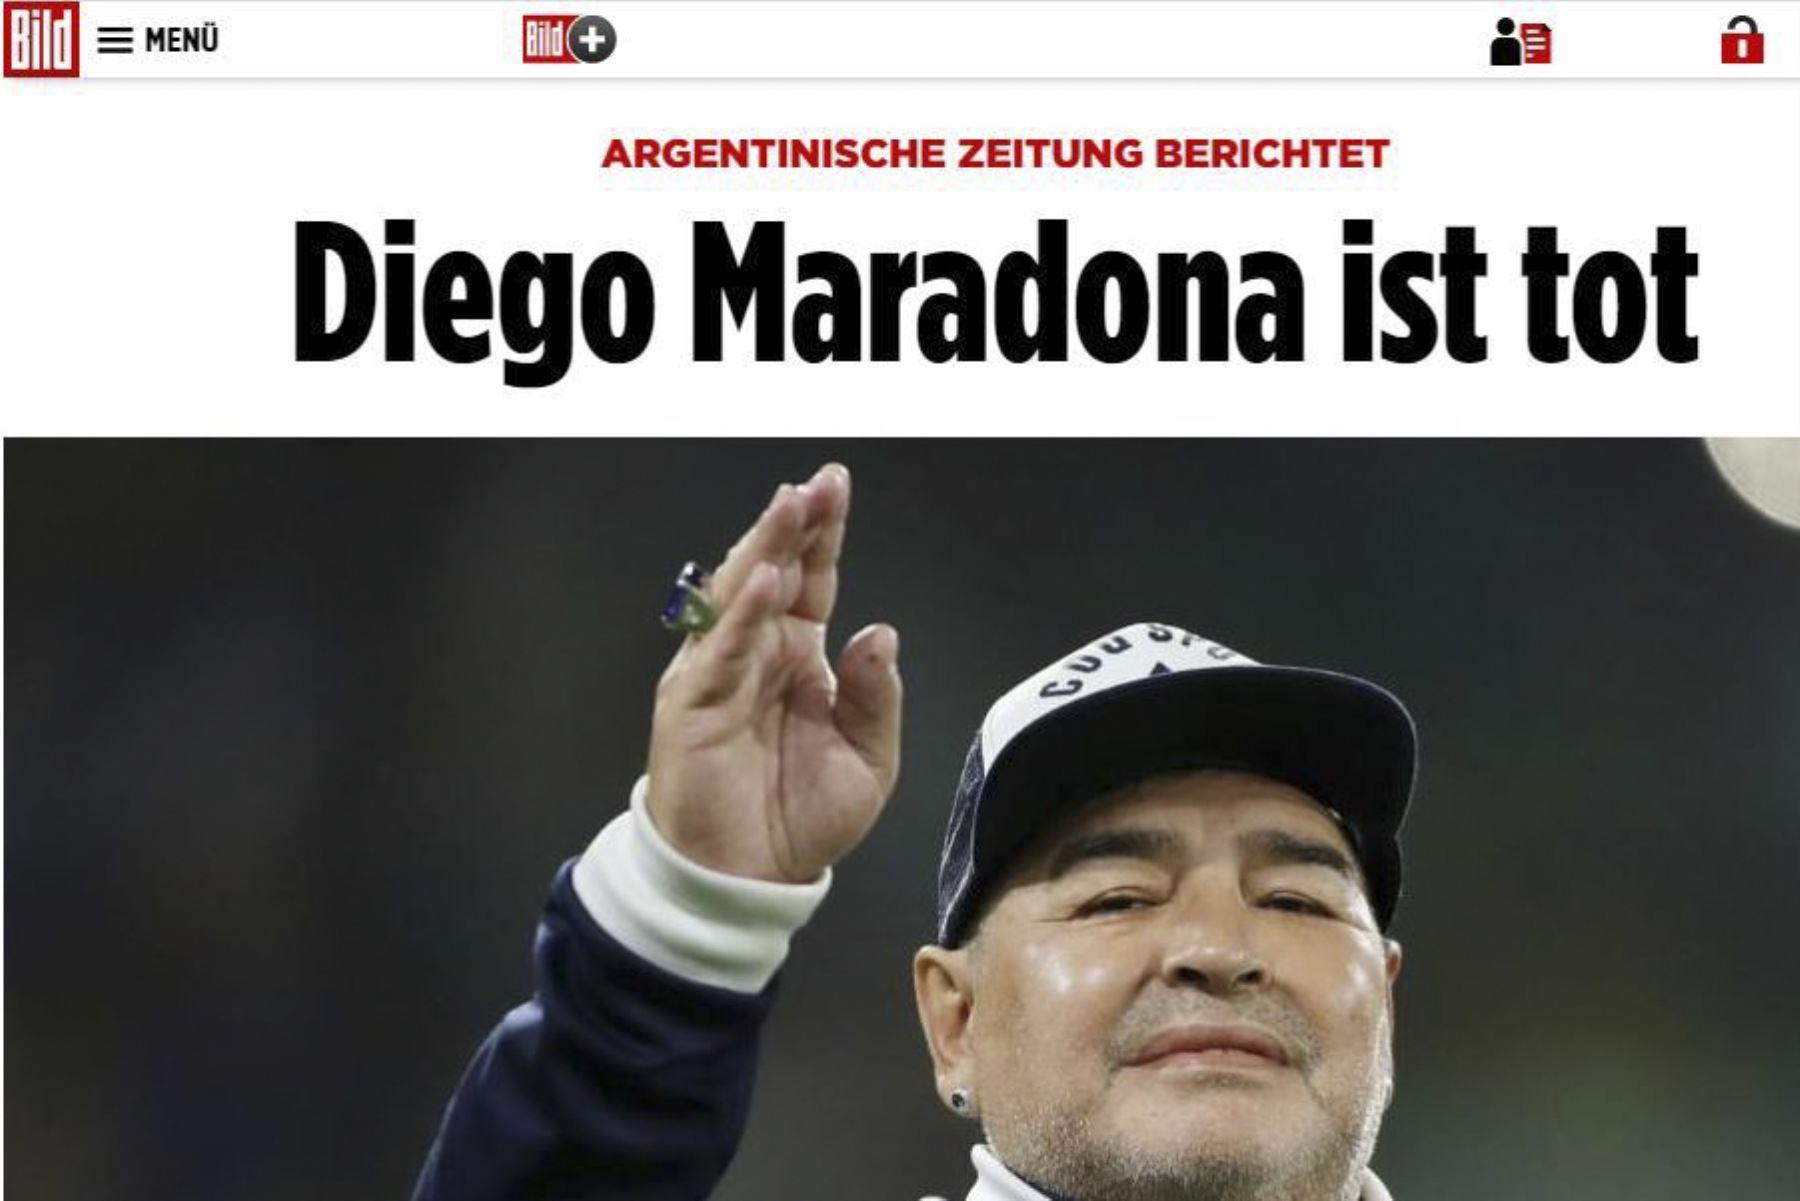 Así informa la prensa mundial la muerte de Diego Armando Maradona. Bild de Alemania